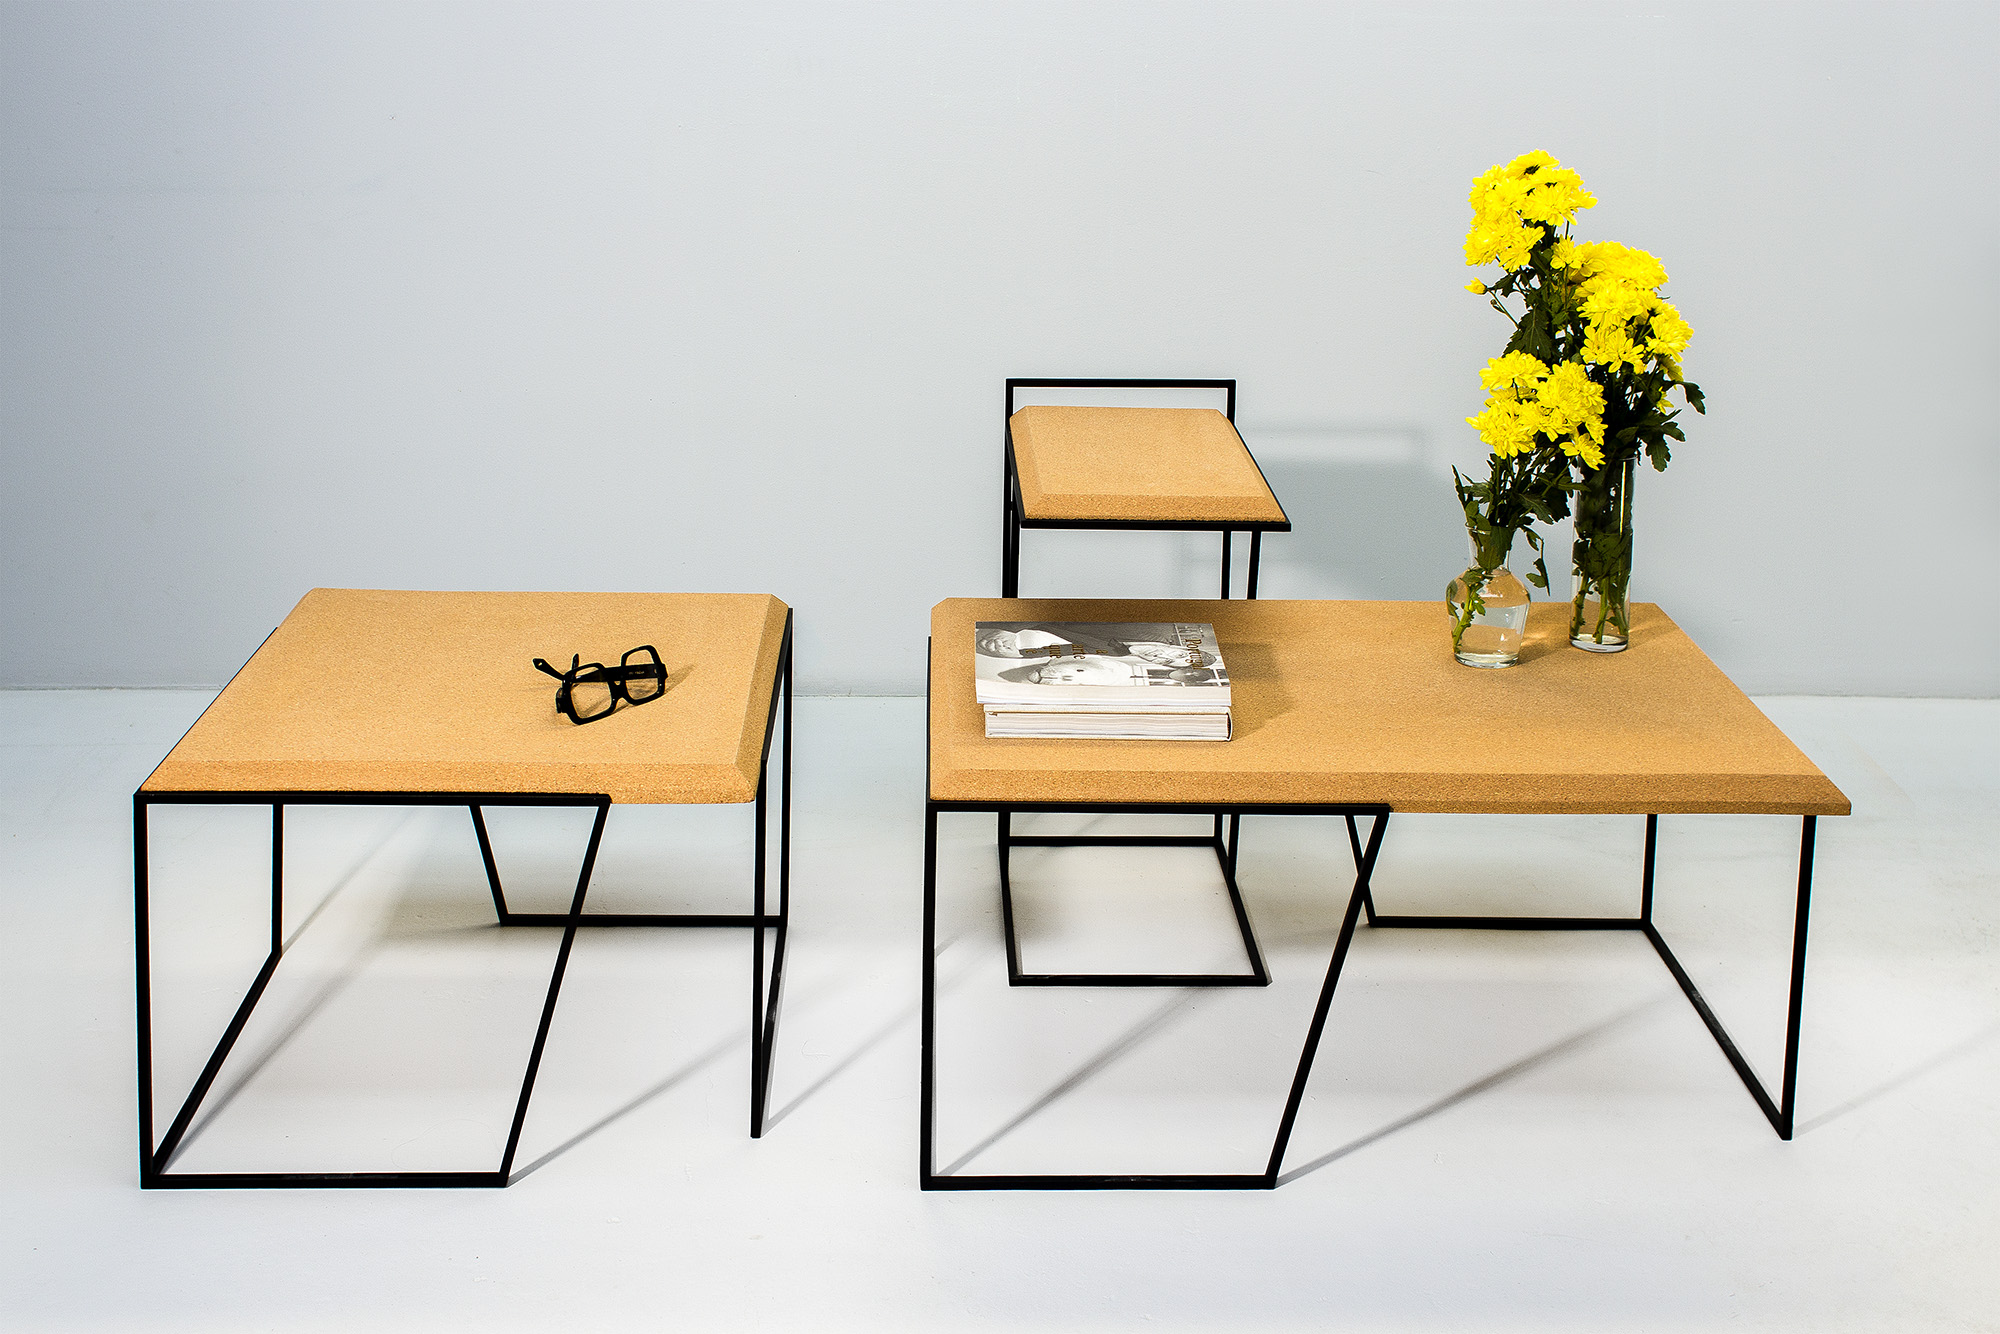 low-Galula-Grão-tables-collection-light-cork-black-10.jpg